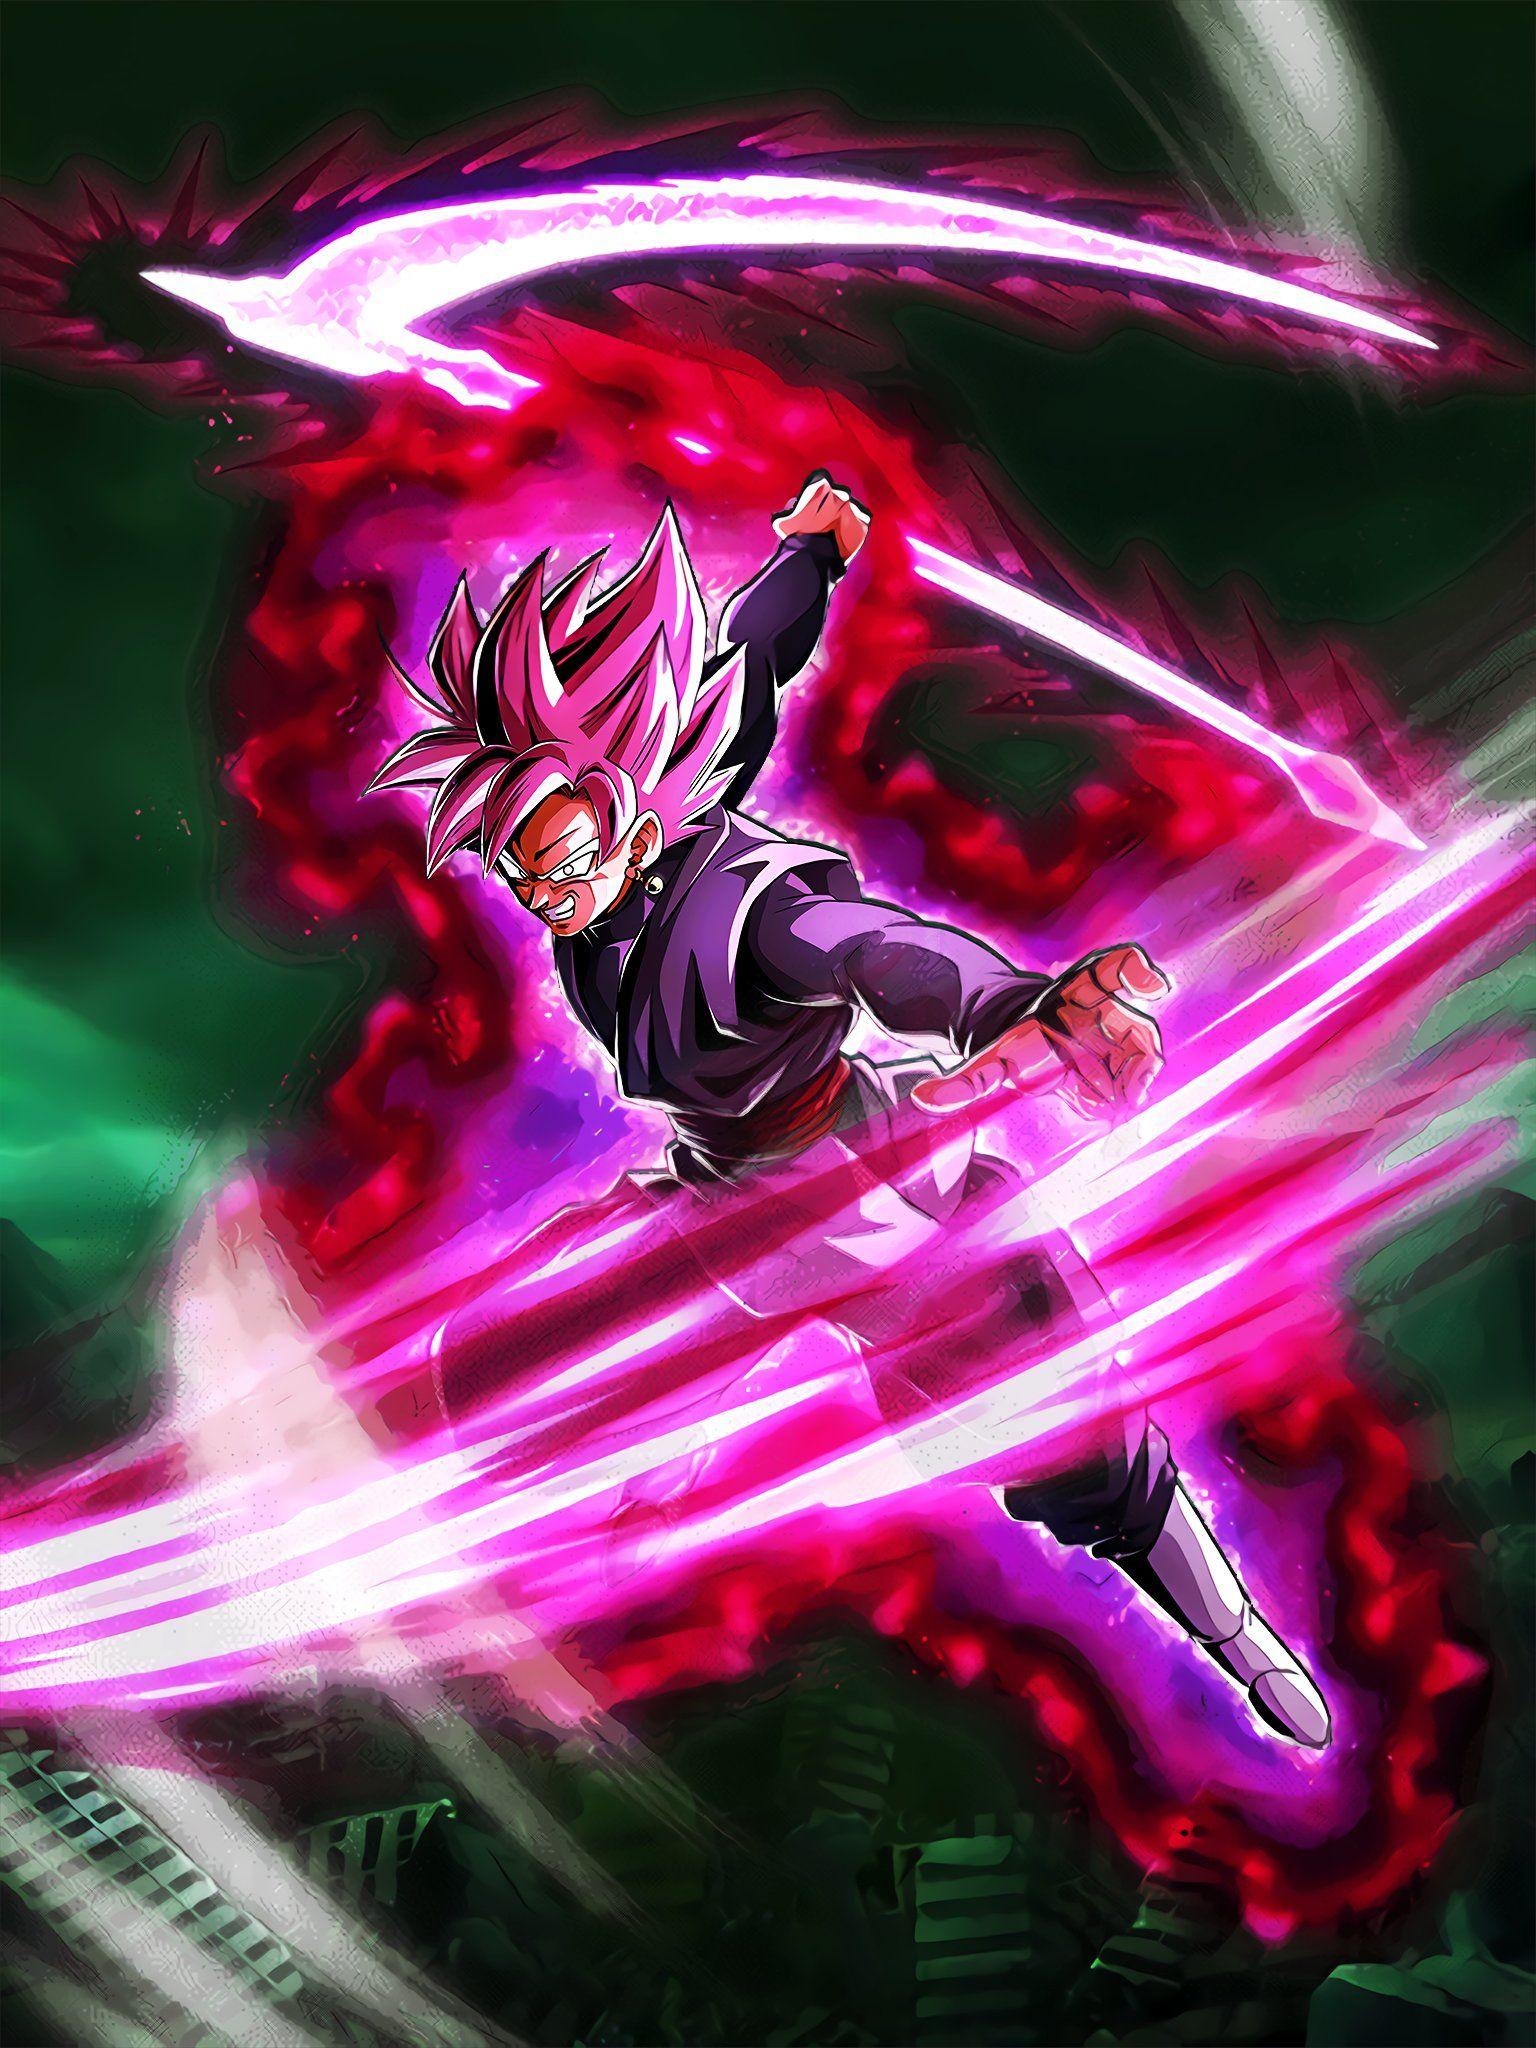 Hydros On Twitter Dragon Ball Super Goku Super Saiyan Rose Goku Black